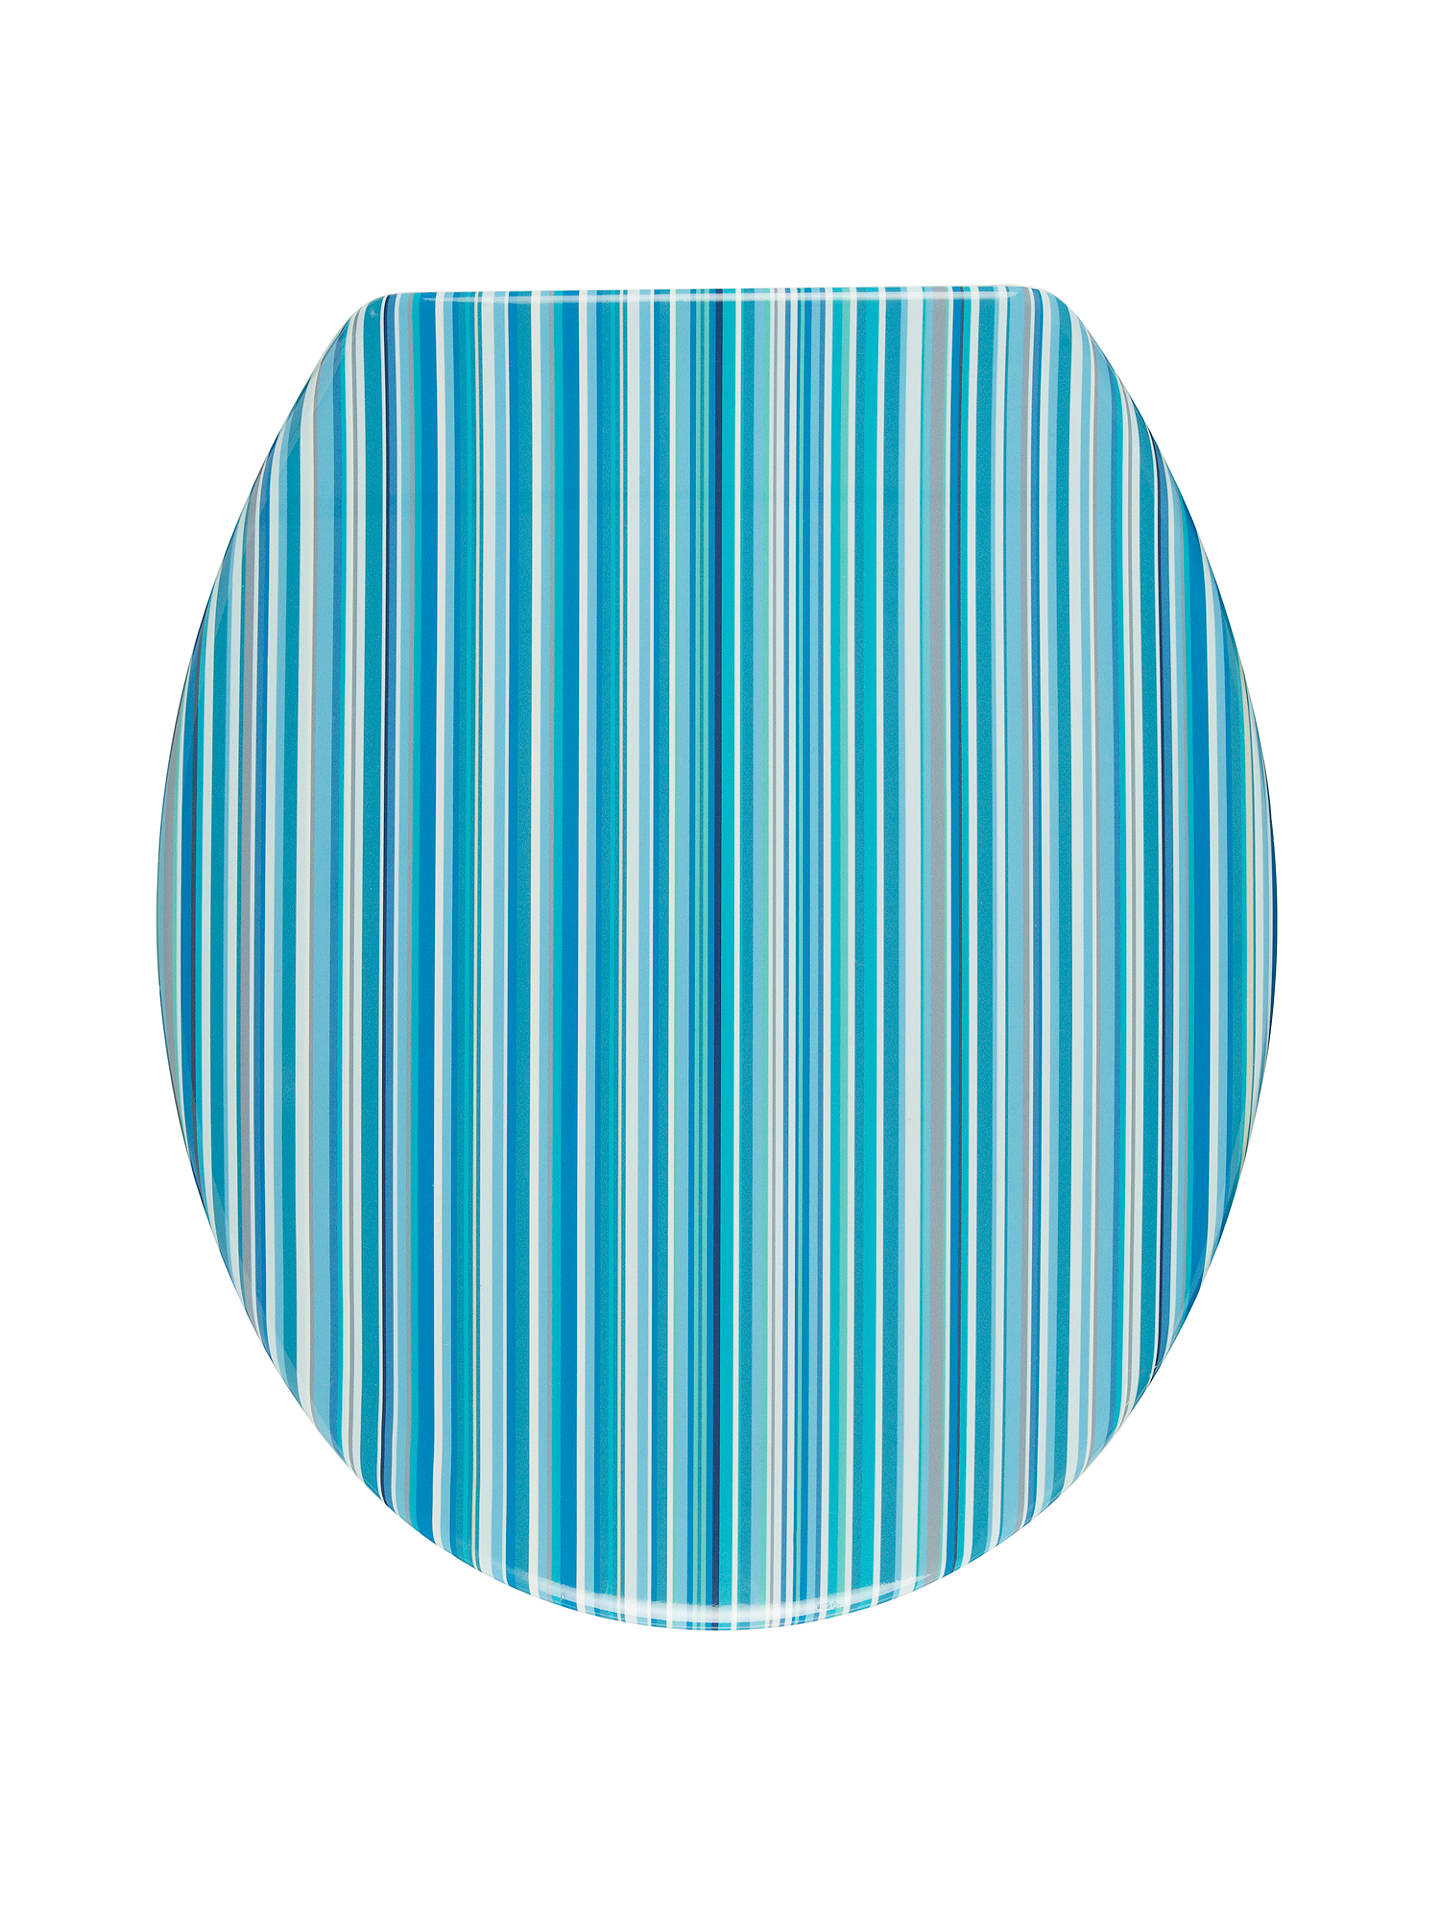 Wondrous John Lewis Stardust Toilet Seat Blue Stripe At John Lewis Gamerscity Chair Design For Home Gamerscityorg